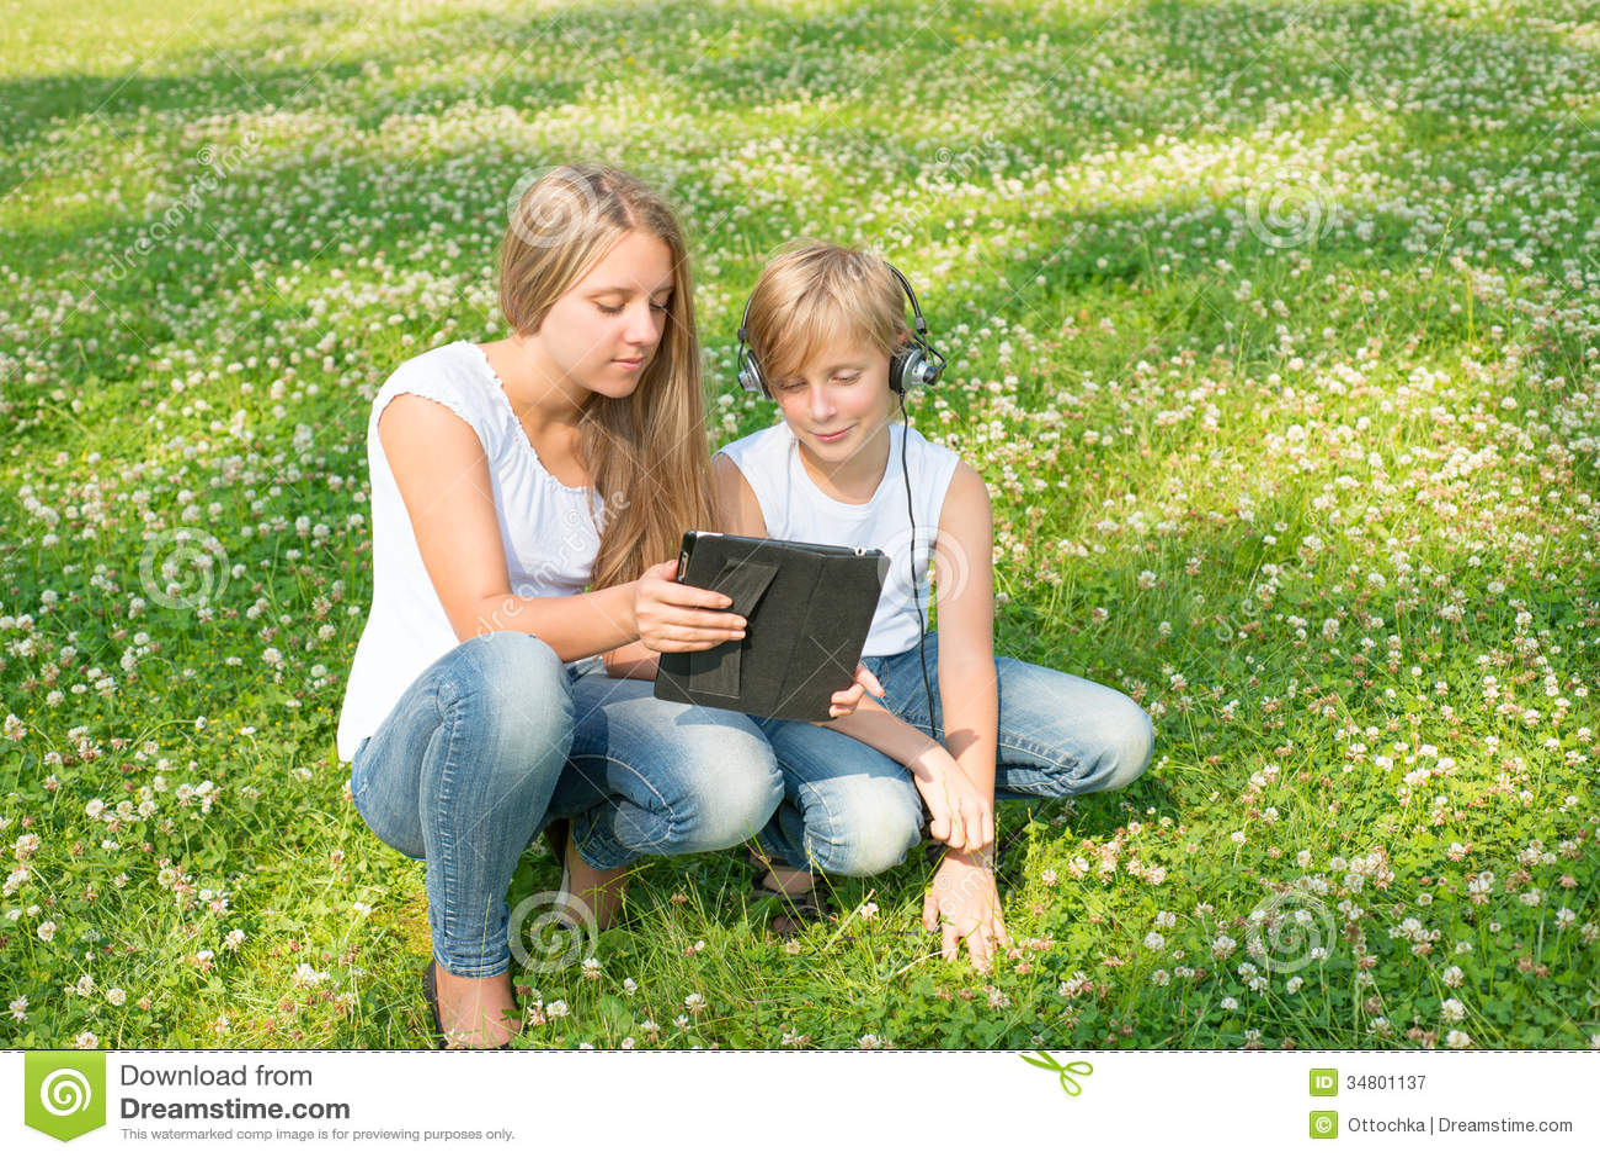 раздевание на брат карты с сестрой играют инцест в